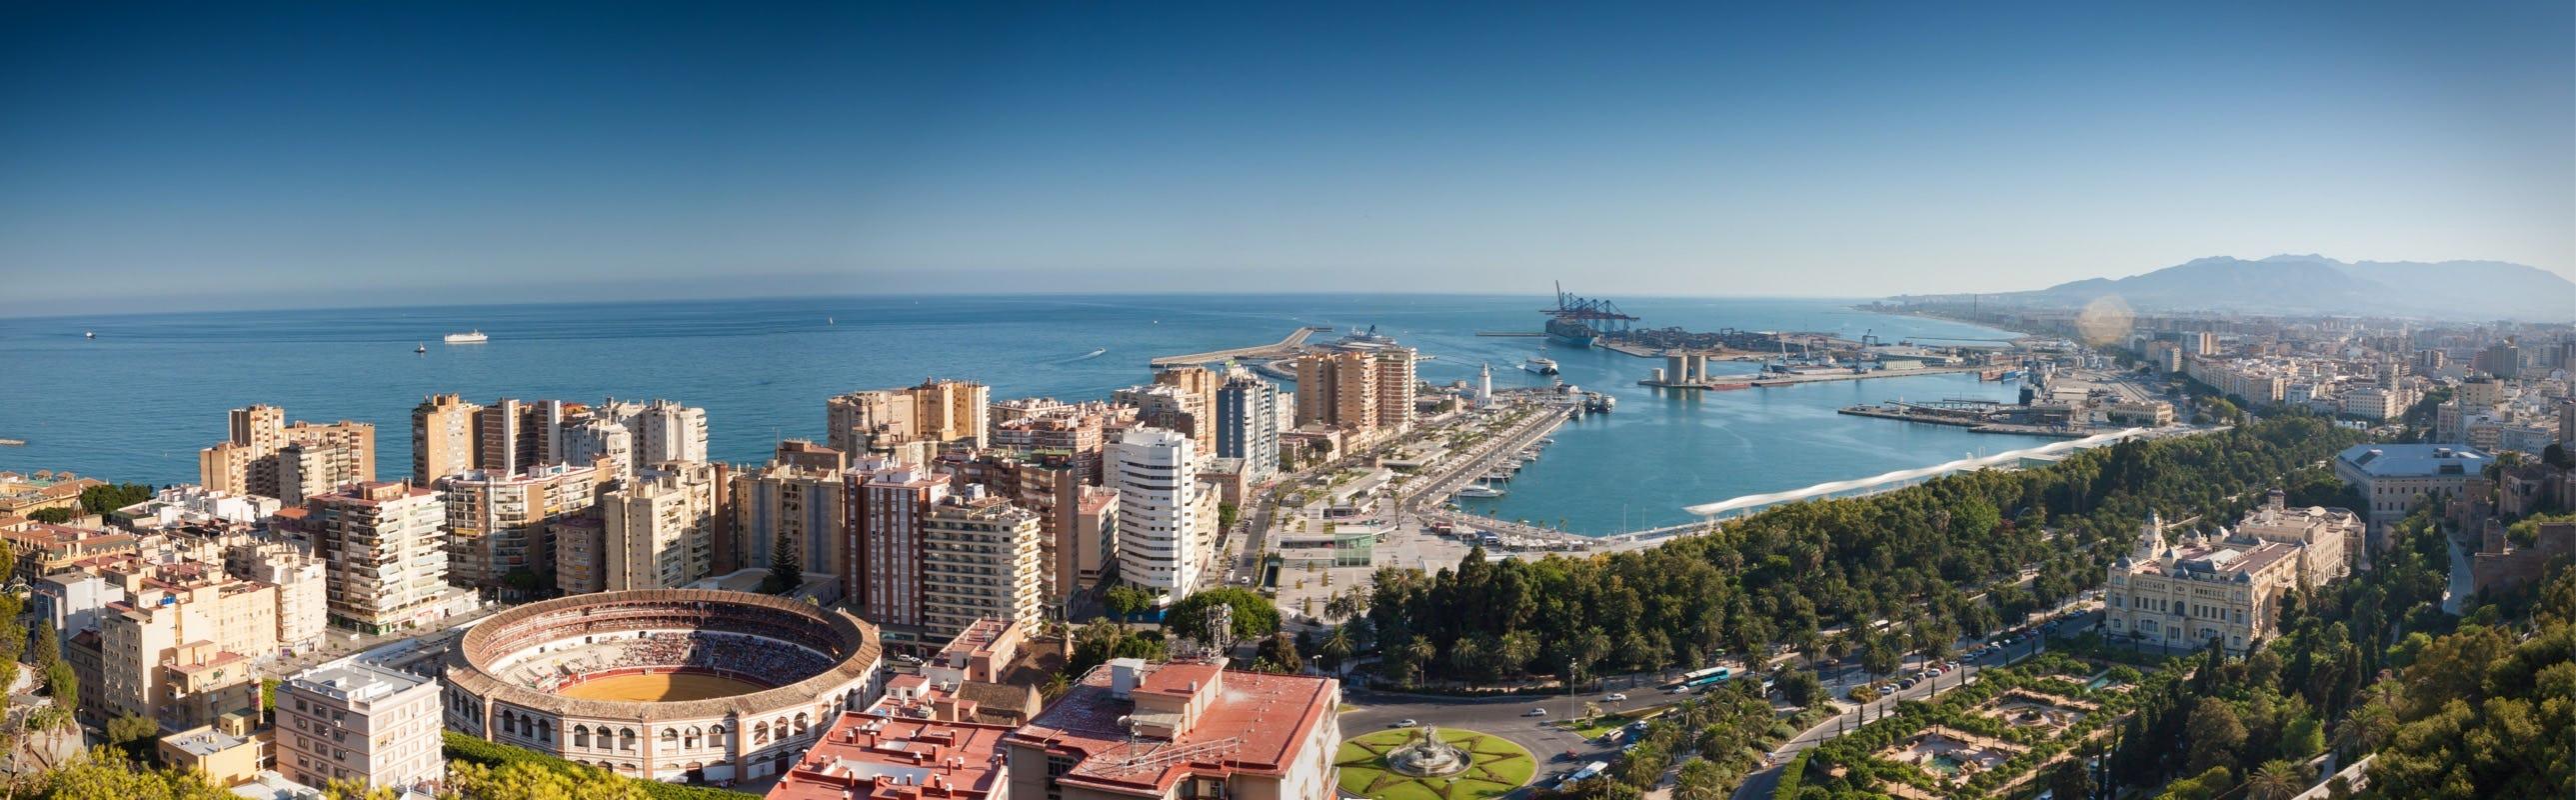 Malaga © Pexels, Pixabay